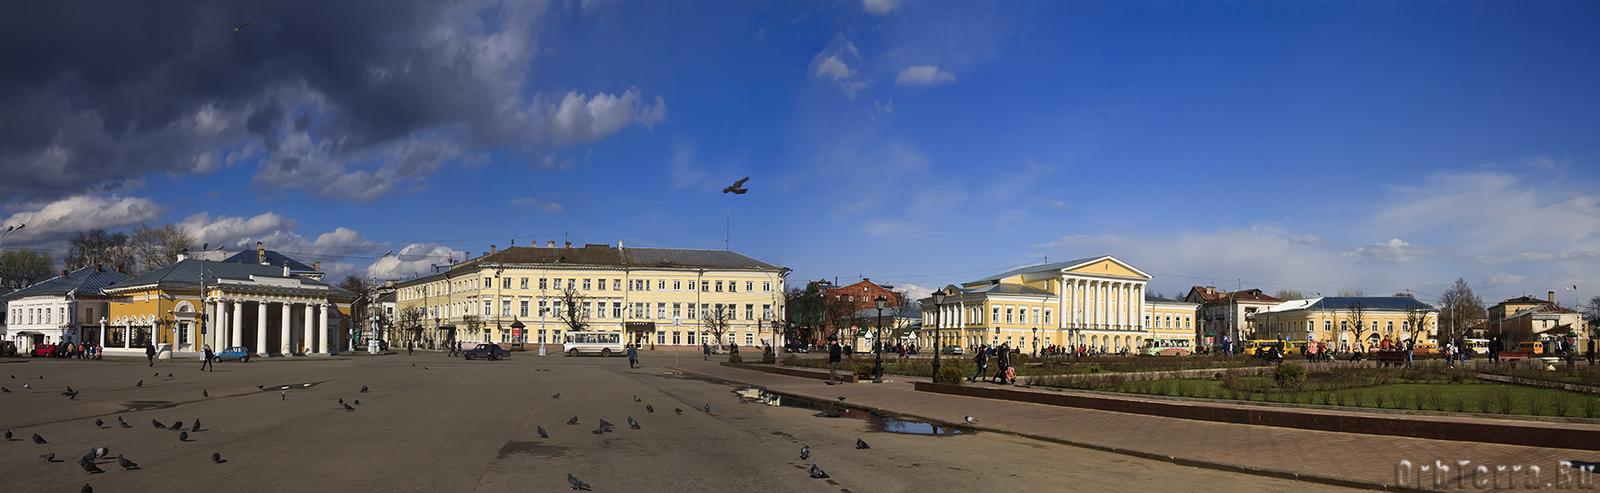 Кострома. Центральная площадь.